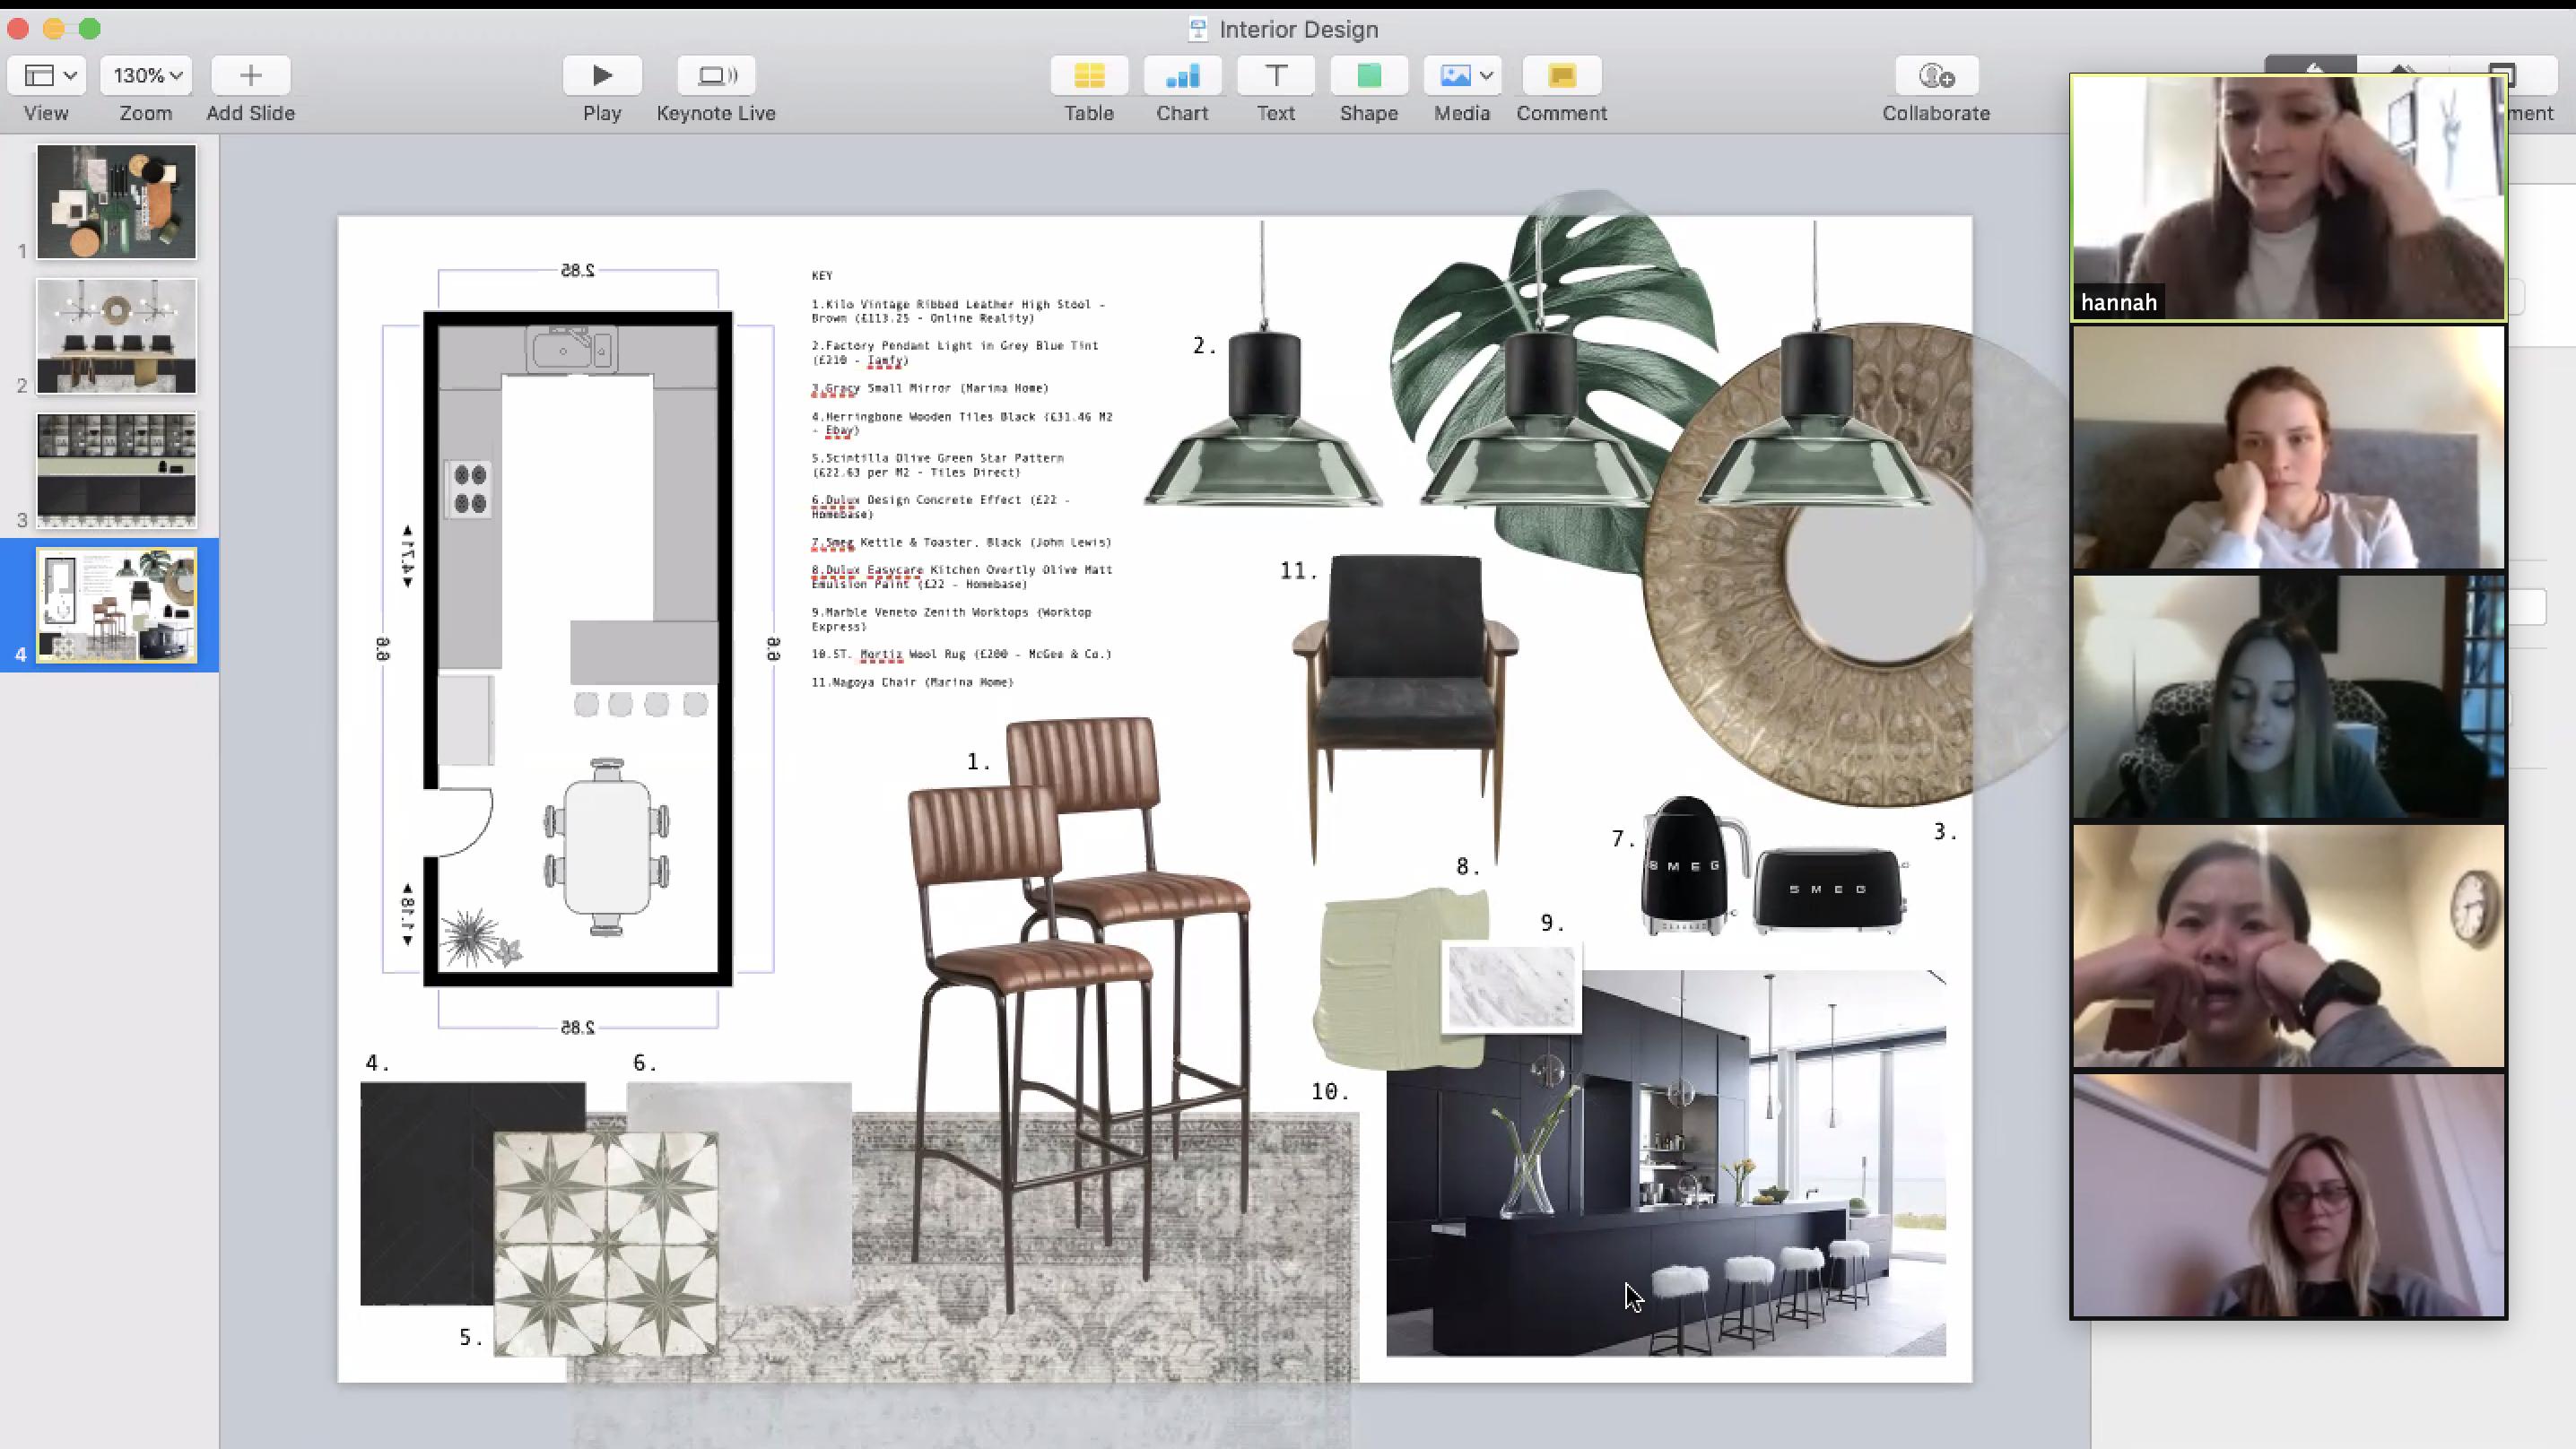 Interior Design Tips Presentation Board Interior Design Retail Design Home Staging Consultants Edinburgh Vivian chen second place winner 2014 student design. interior design tips presentation